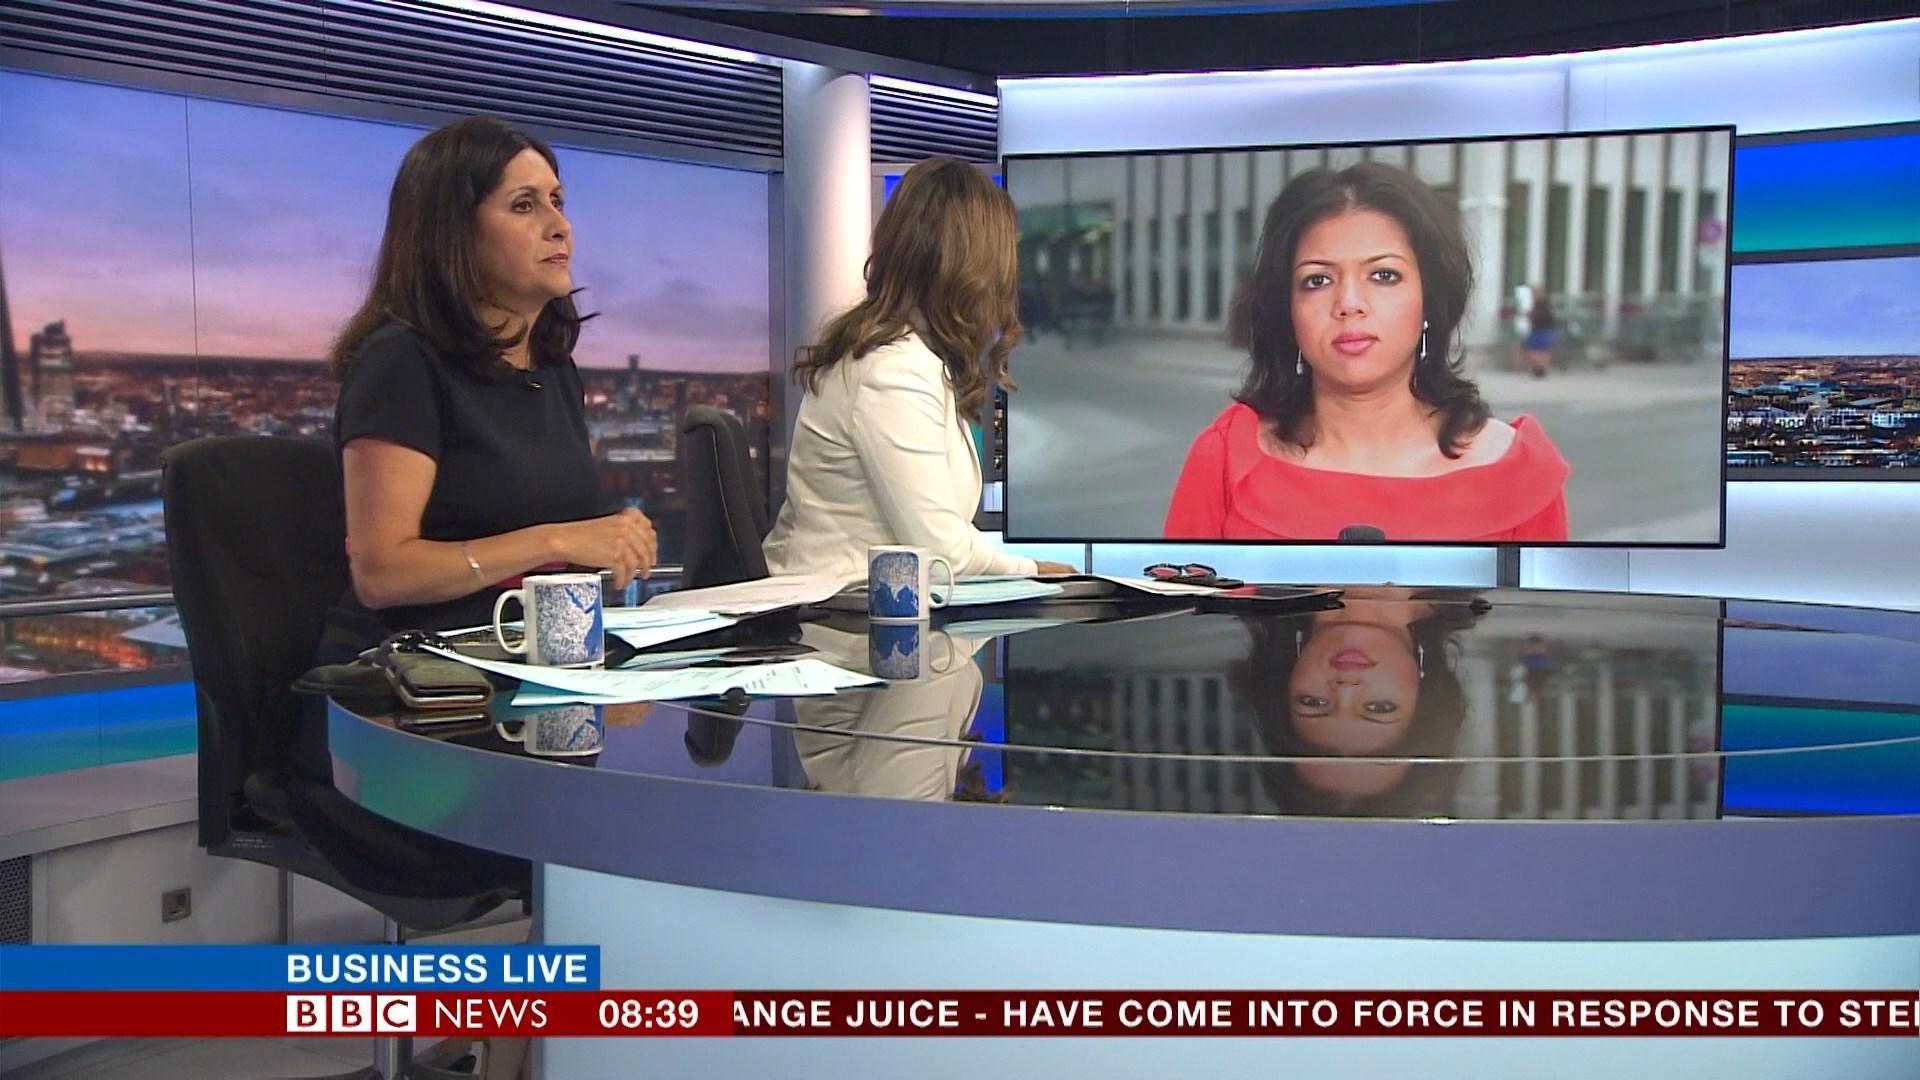 73617405_bbc-business-live_20180622_08300900-ts_snapshot_10-50_-2018-06-22_11-08-51.jpg